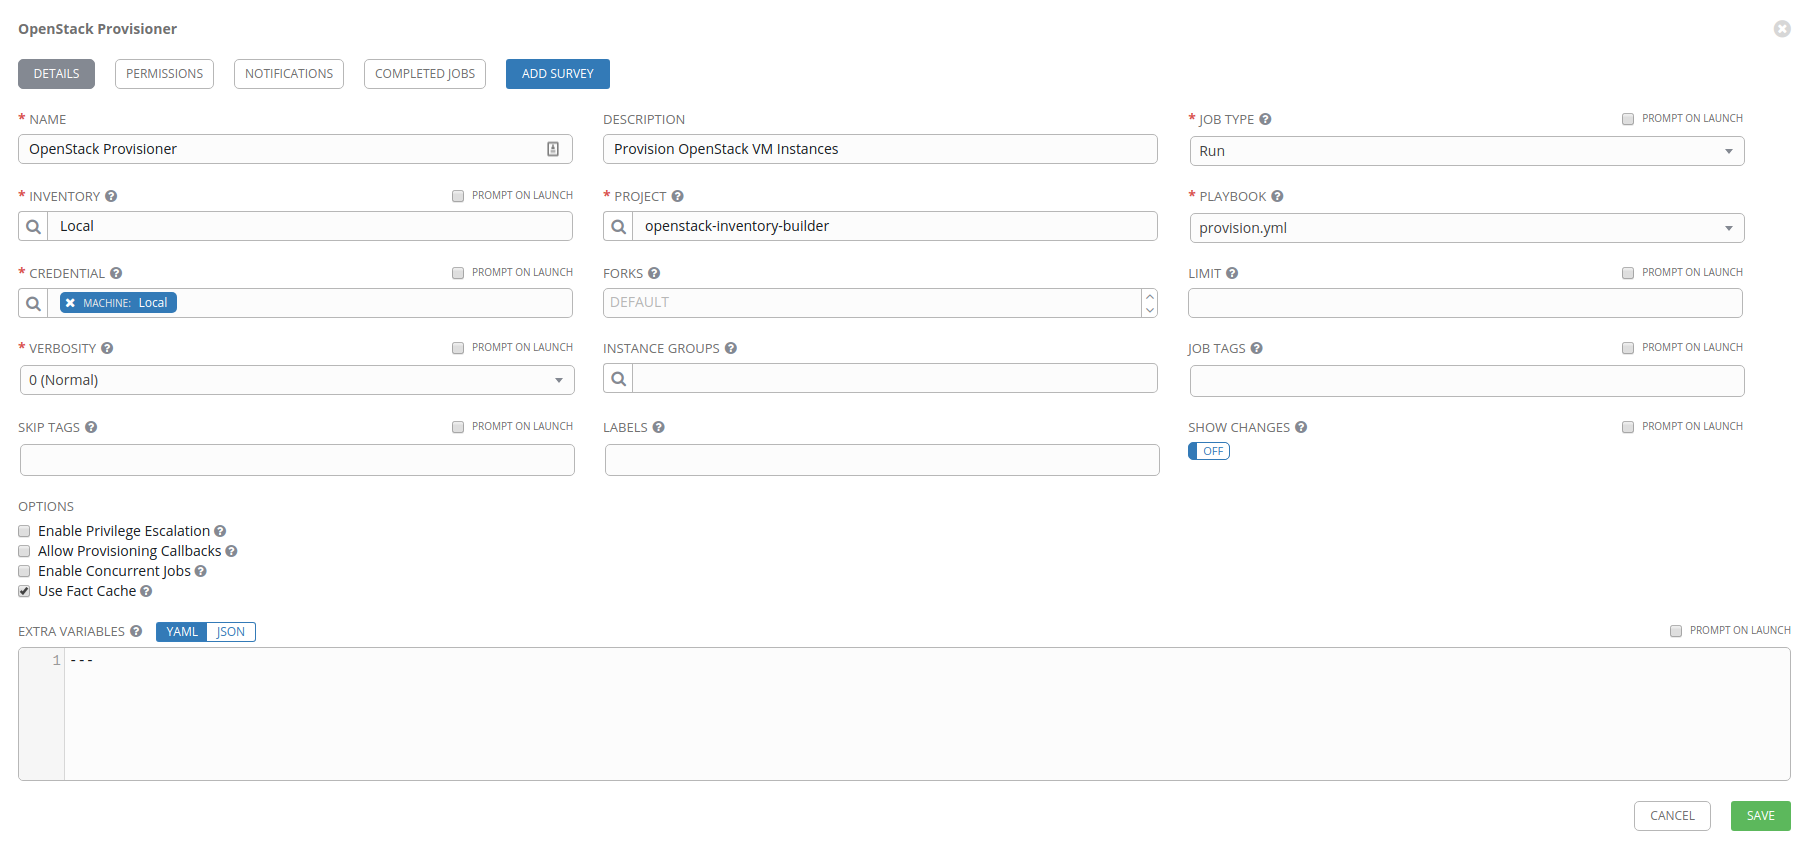 OpenStack Provisioner job configuration